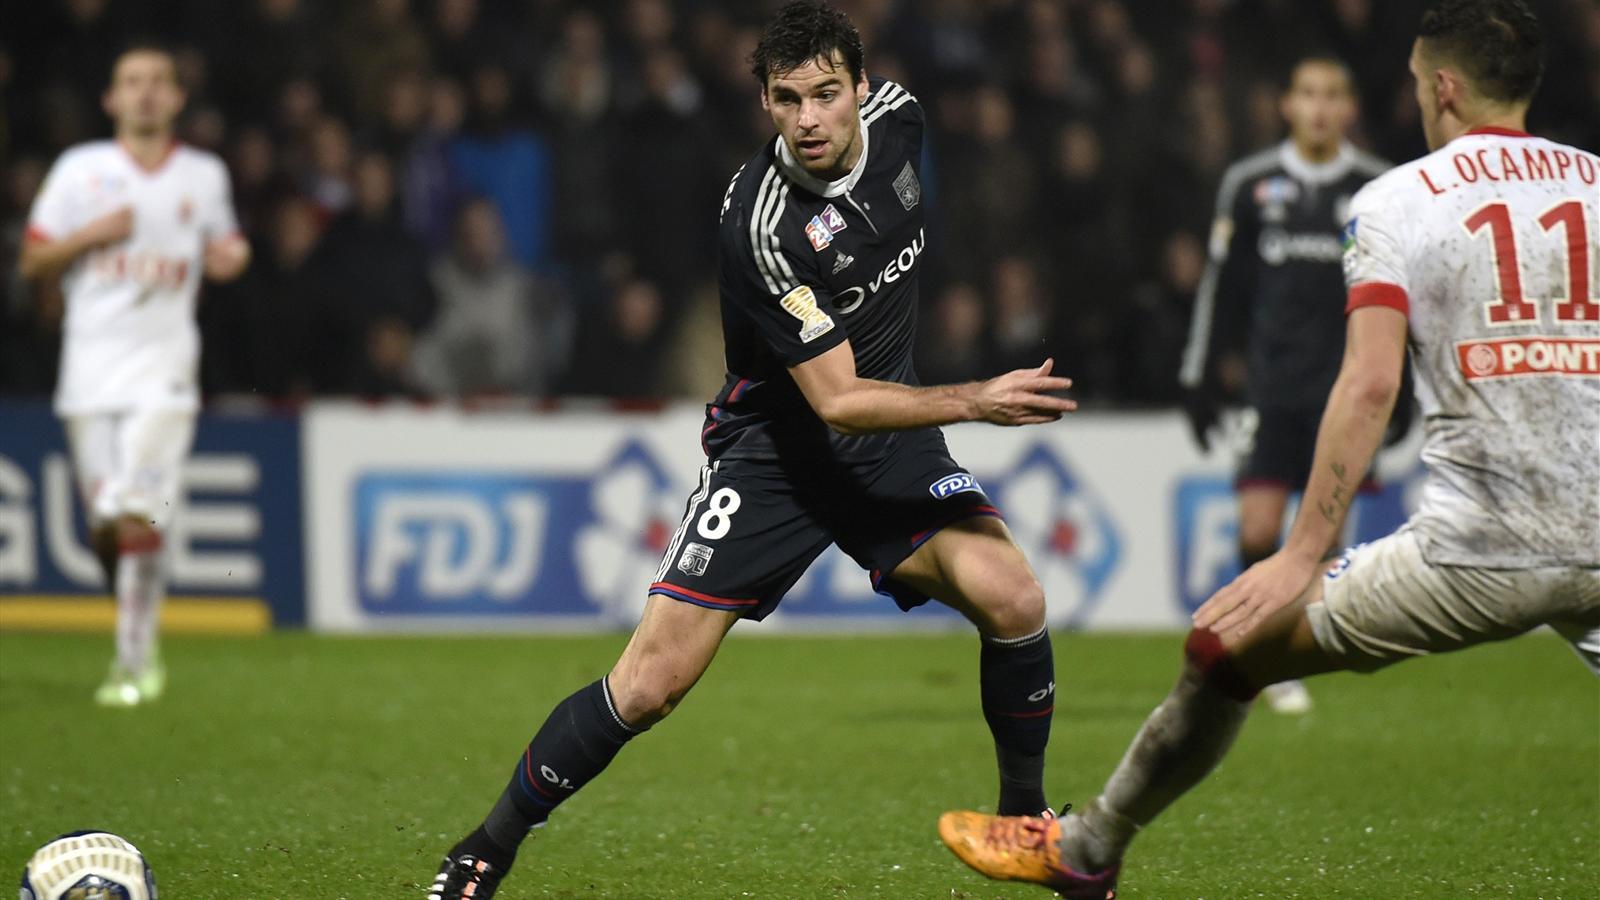 Coupe de la ligue ol asm 1 1 4 tab 5 gourcuff le contre pied qui a contrari lyon - Lyon monaco coupe de la ligue 2014 ...